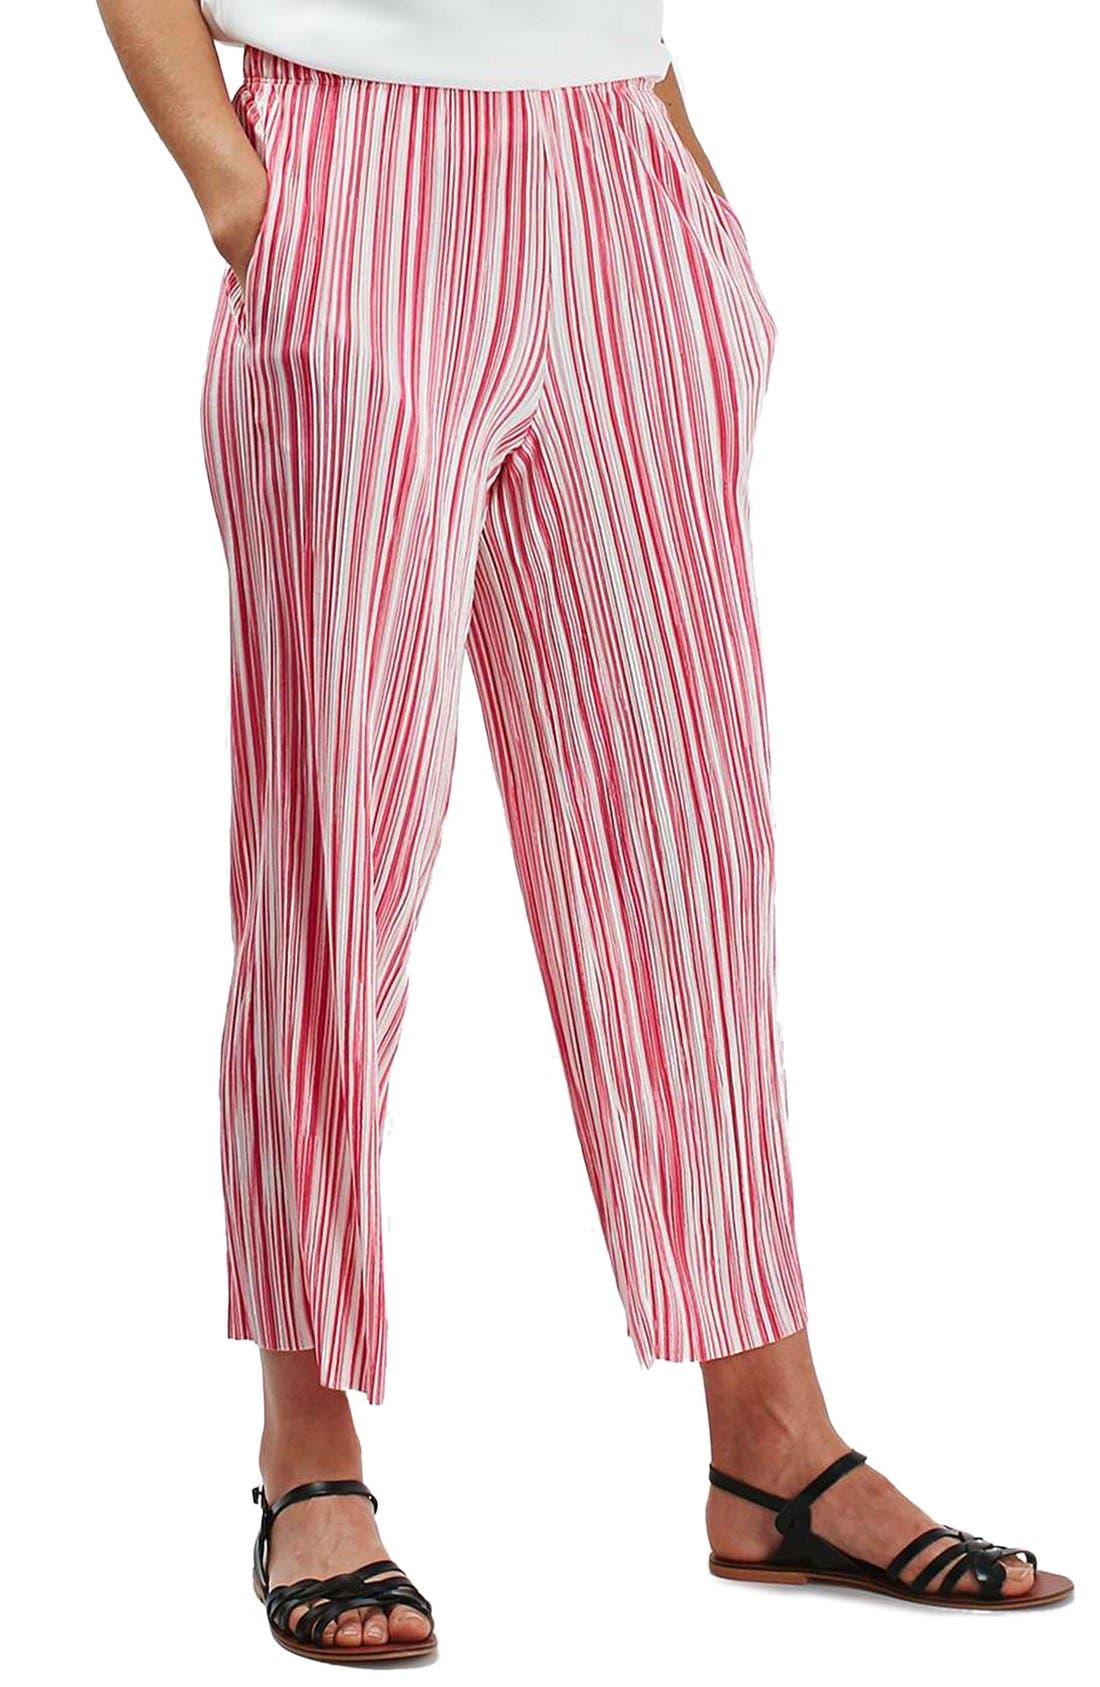 Alternate Image 1 Selected - Topshop Stripe Pleat Crop Trousers